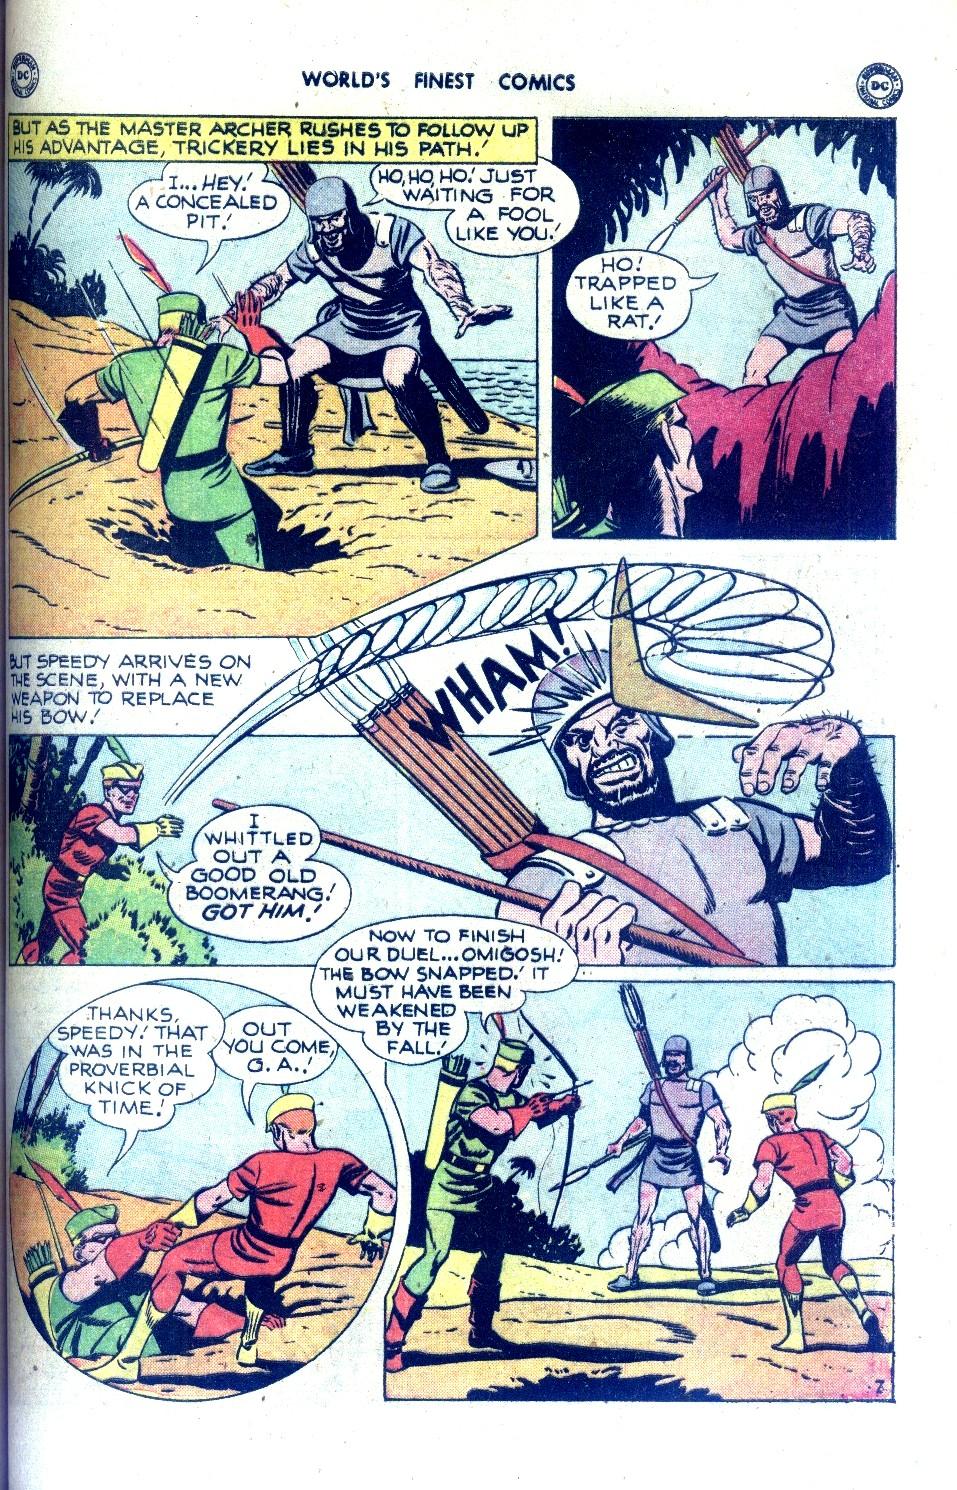 Read online World's Finest Comics comic -  Issue #43 - 47